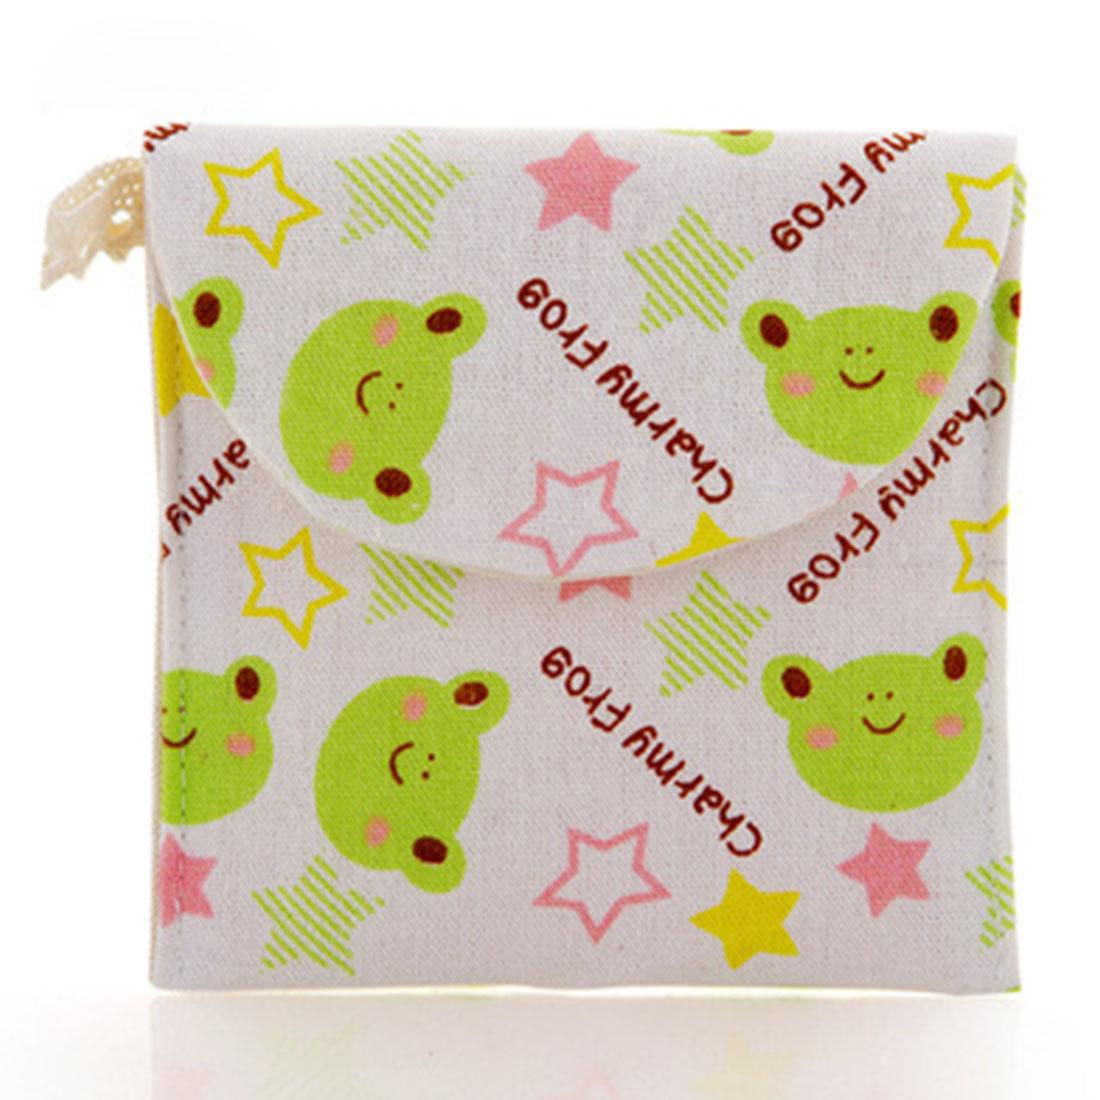 Cute Cotton hygiene kits Admission bag Napkins sanitary protection sanitary towel bag sanitary napkin Storage bags Cosmetic(China (Mainland))